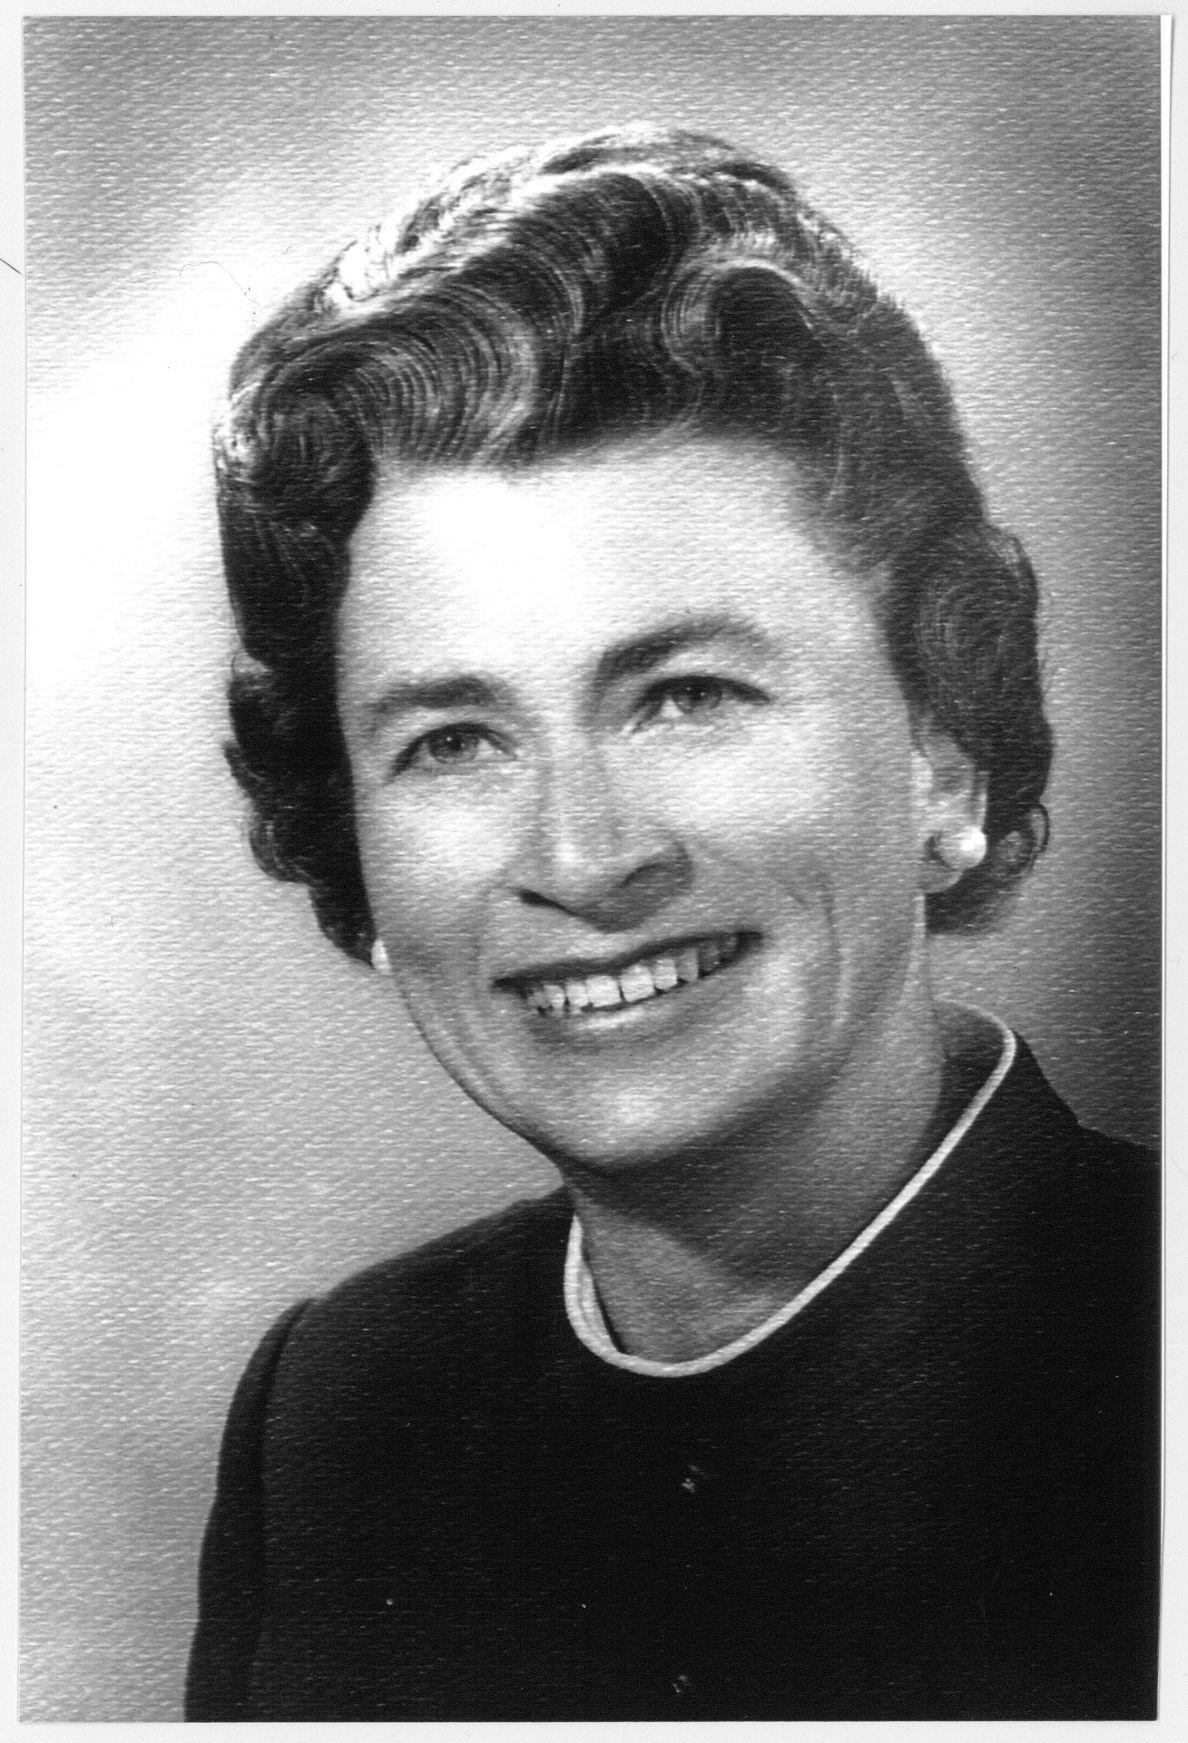 Patricia Ruth 'Myers' Mizer